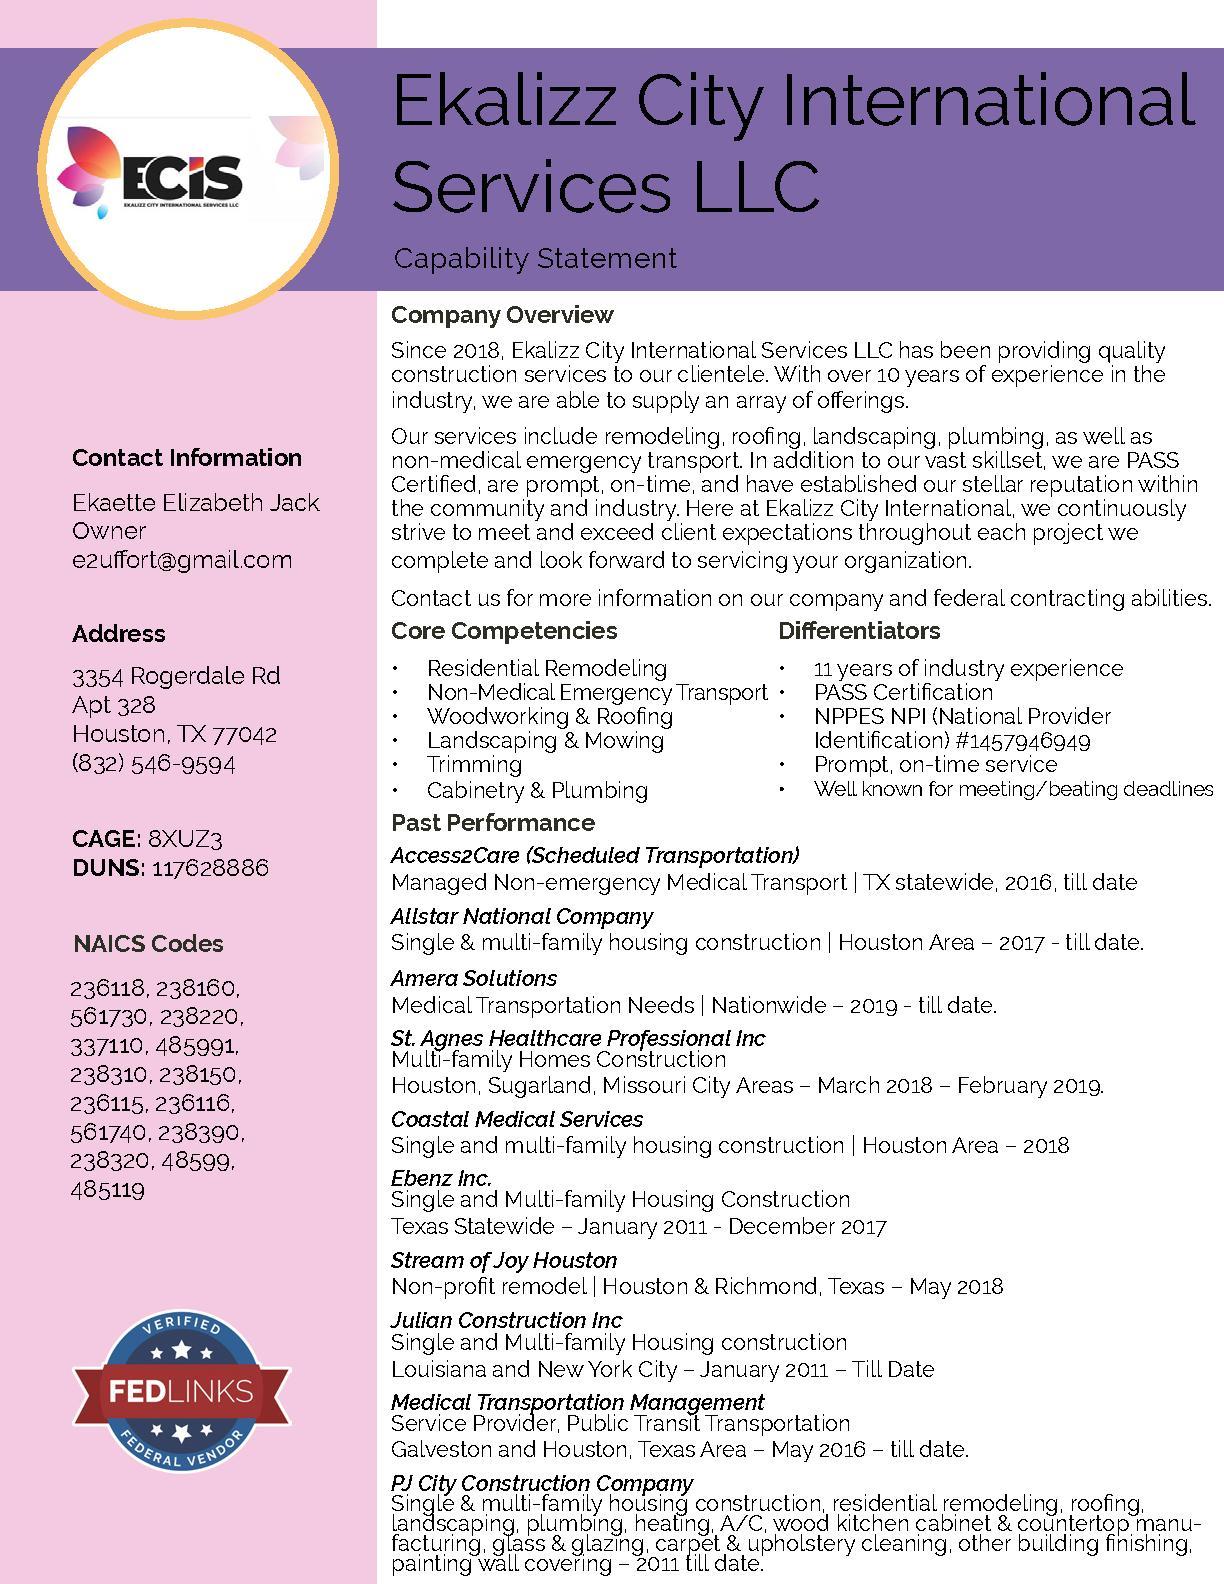 Ekalizz city international services llc capability statement